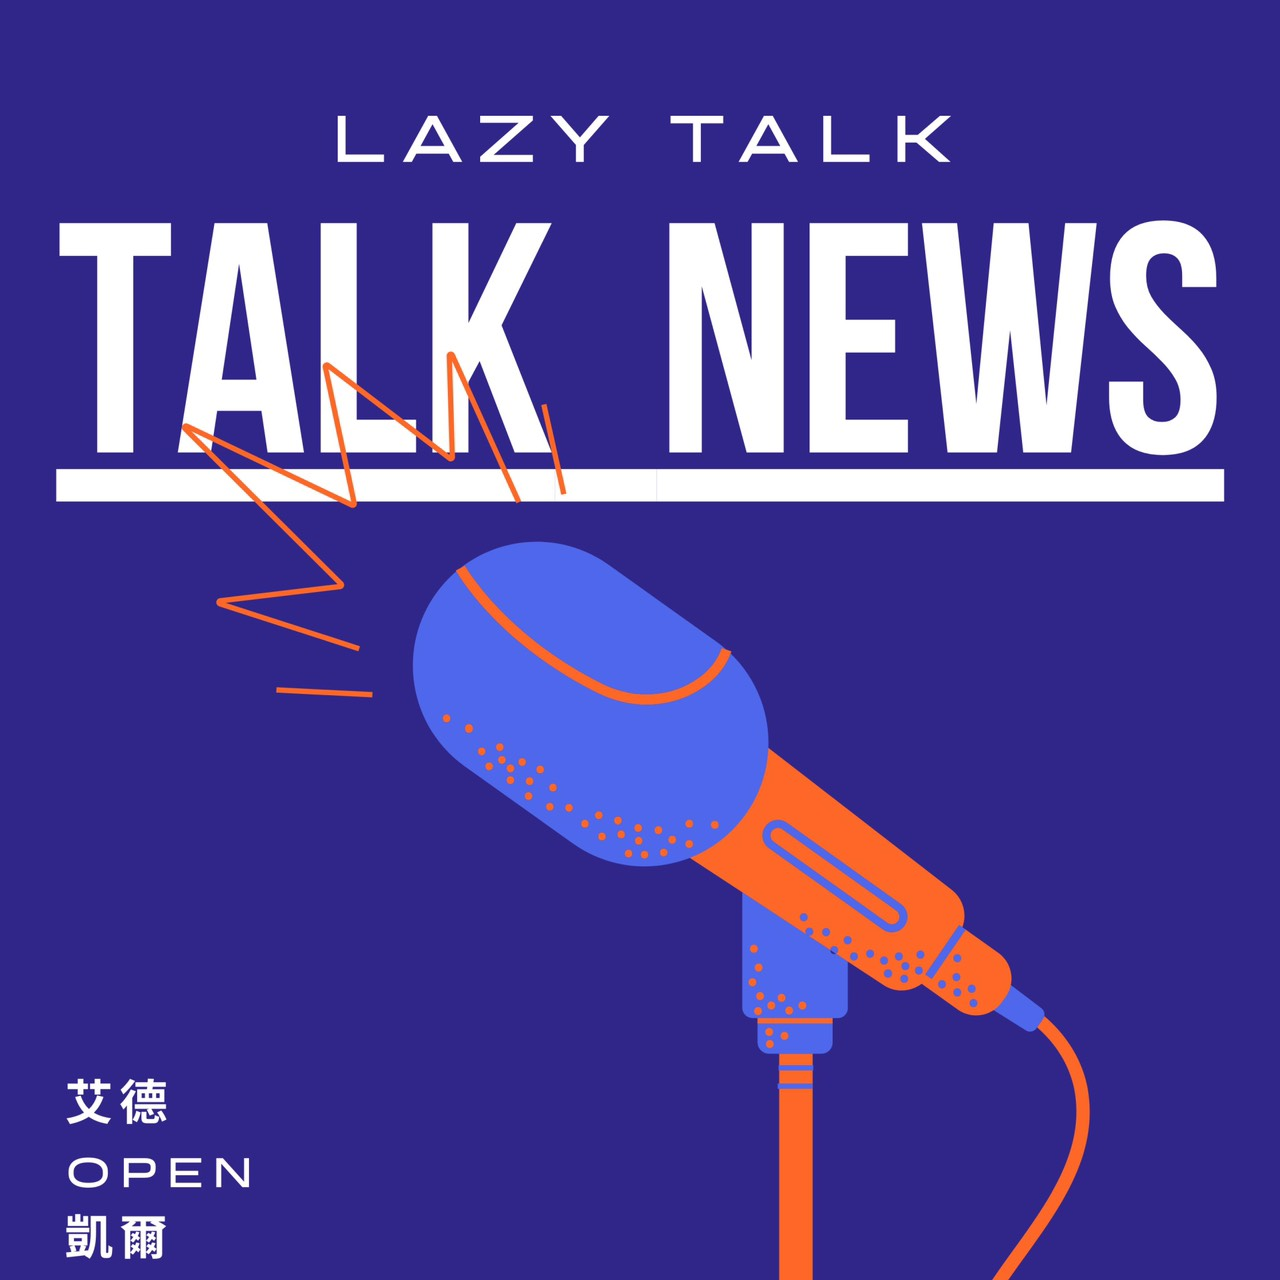 [Talk News]透時事#14 - 你今天極簡了嗎?